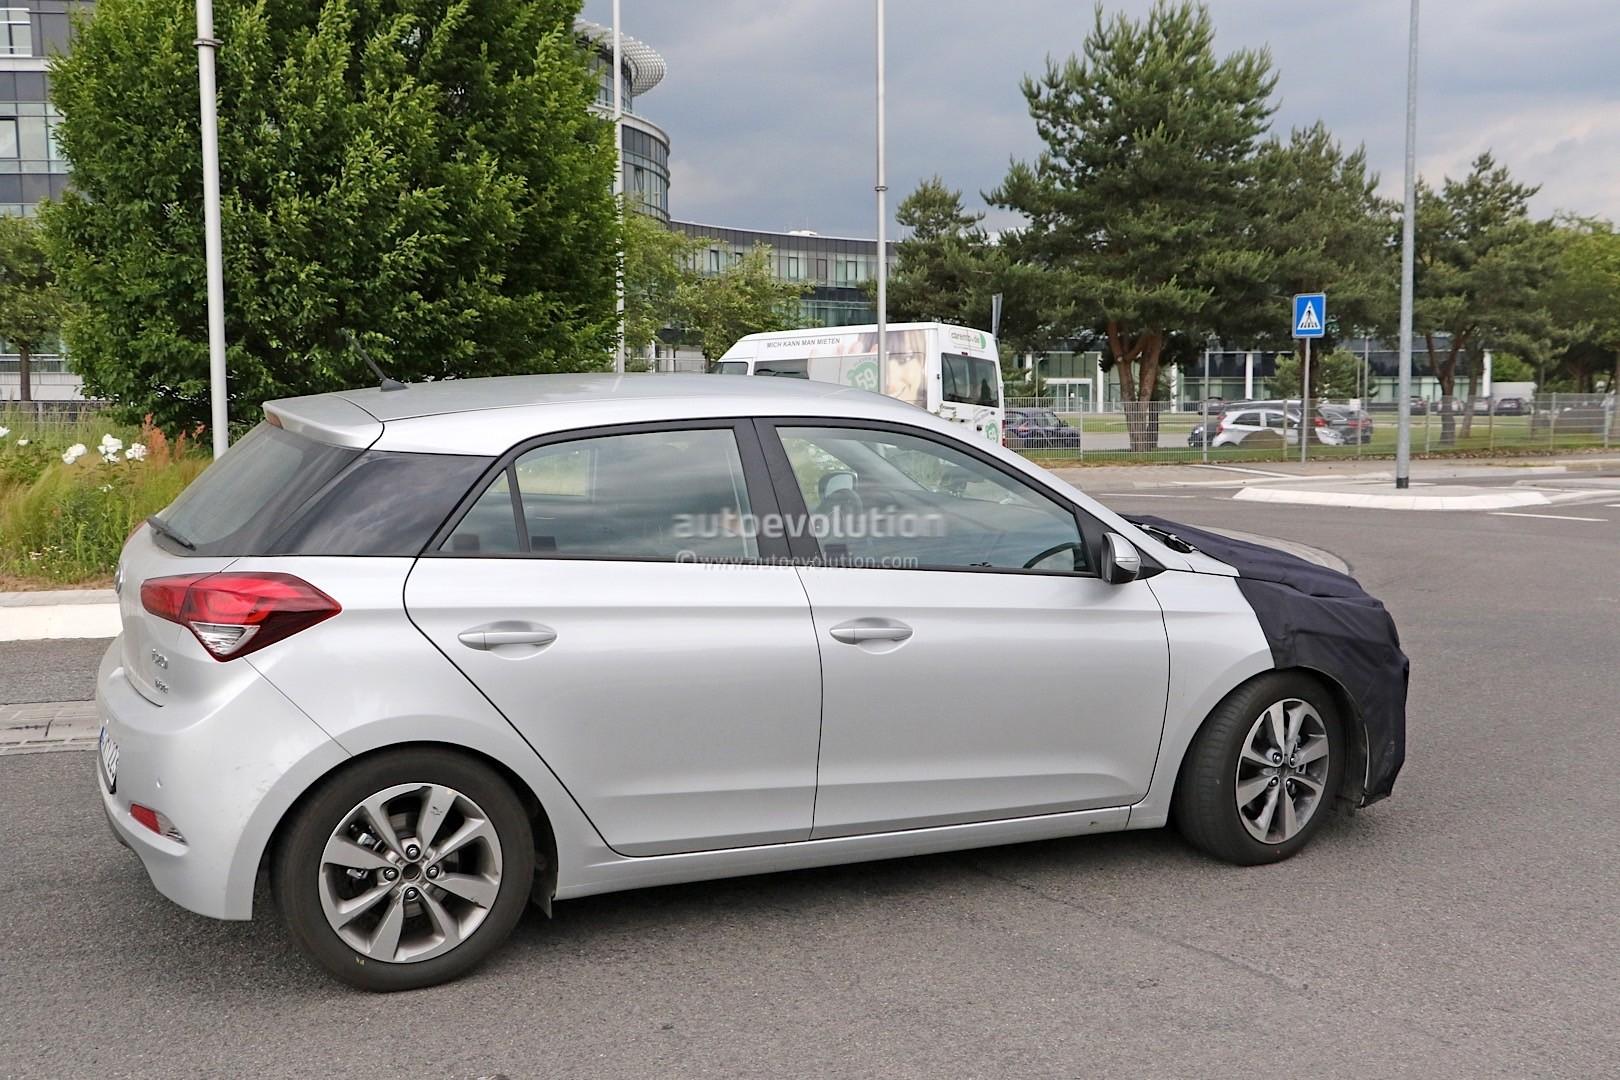 2018 - [Hyundai] I20 restylée Spyshots-hyundai-i20-prototype-spied-we-think-it-s-a-facelifted-version_5